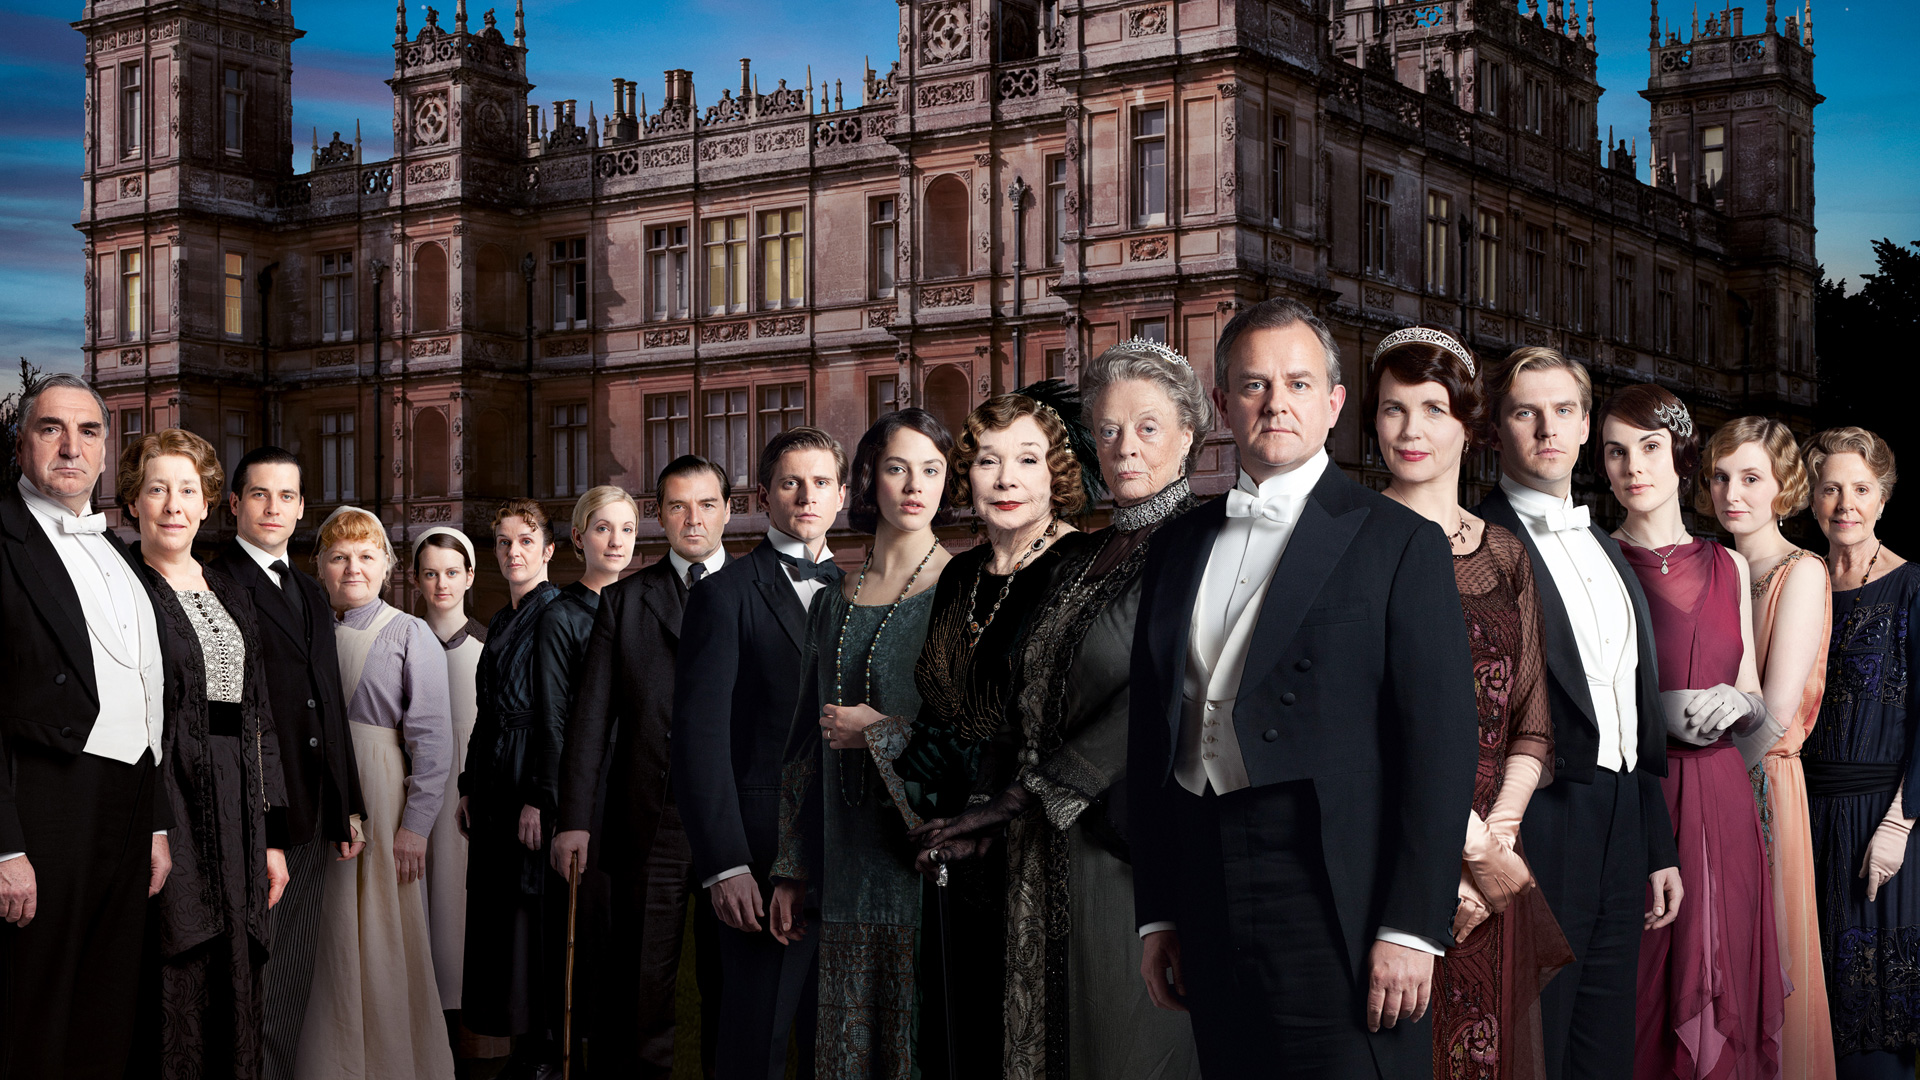 Downton Abbey | Know Your Meme